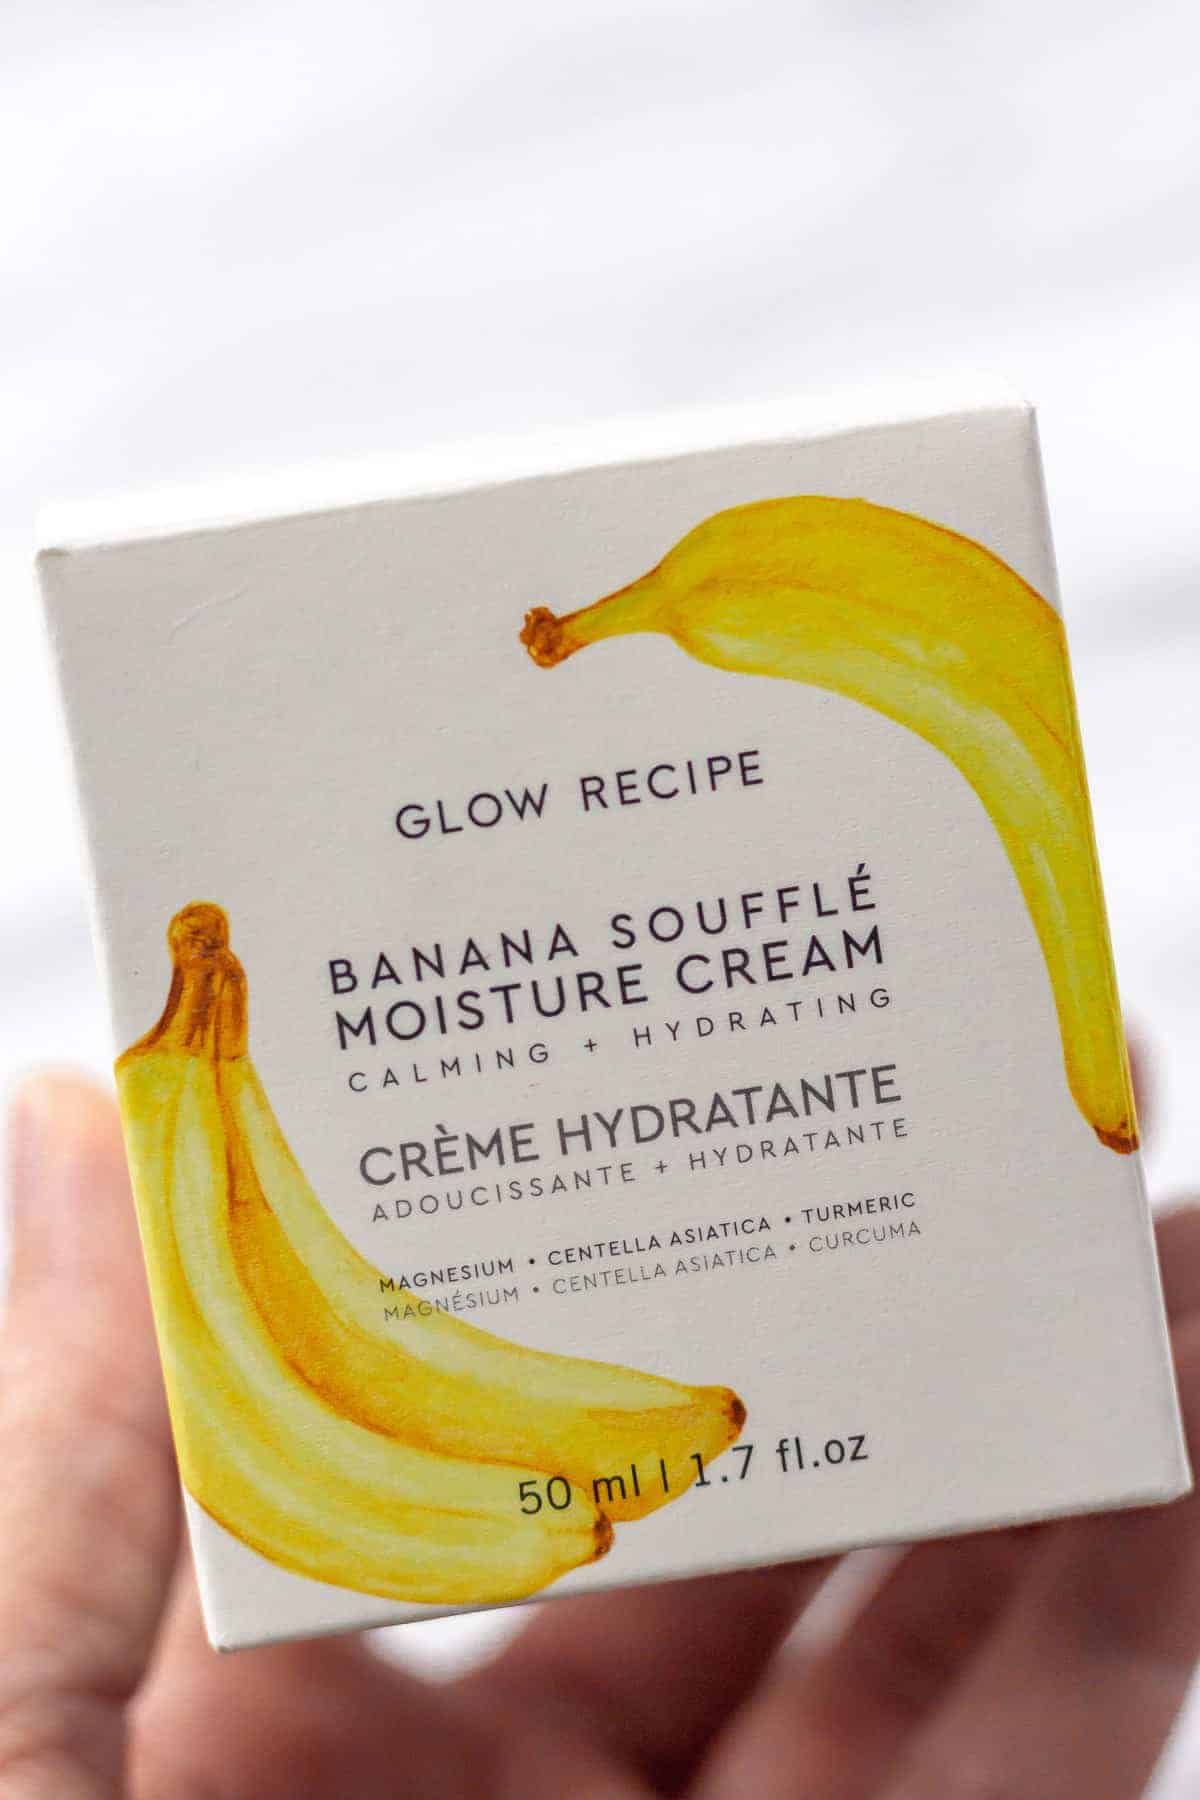 Glow Recipe Banana Souffle Moisture Cream Box